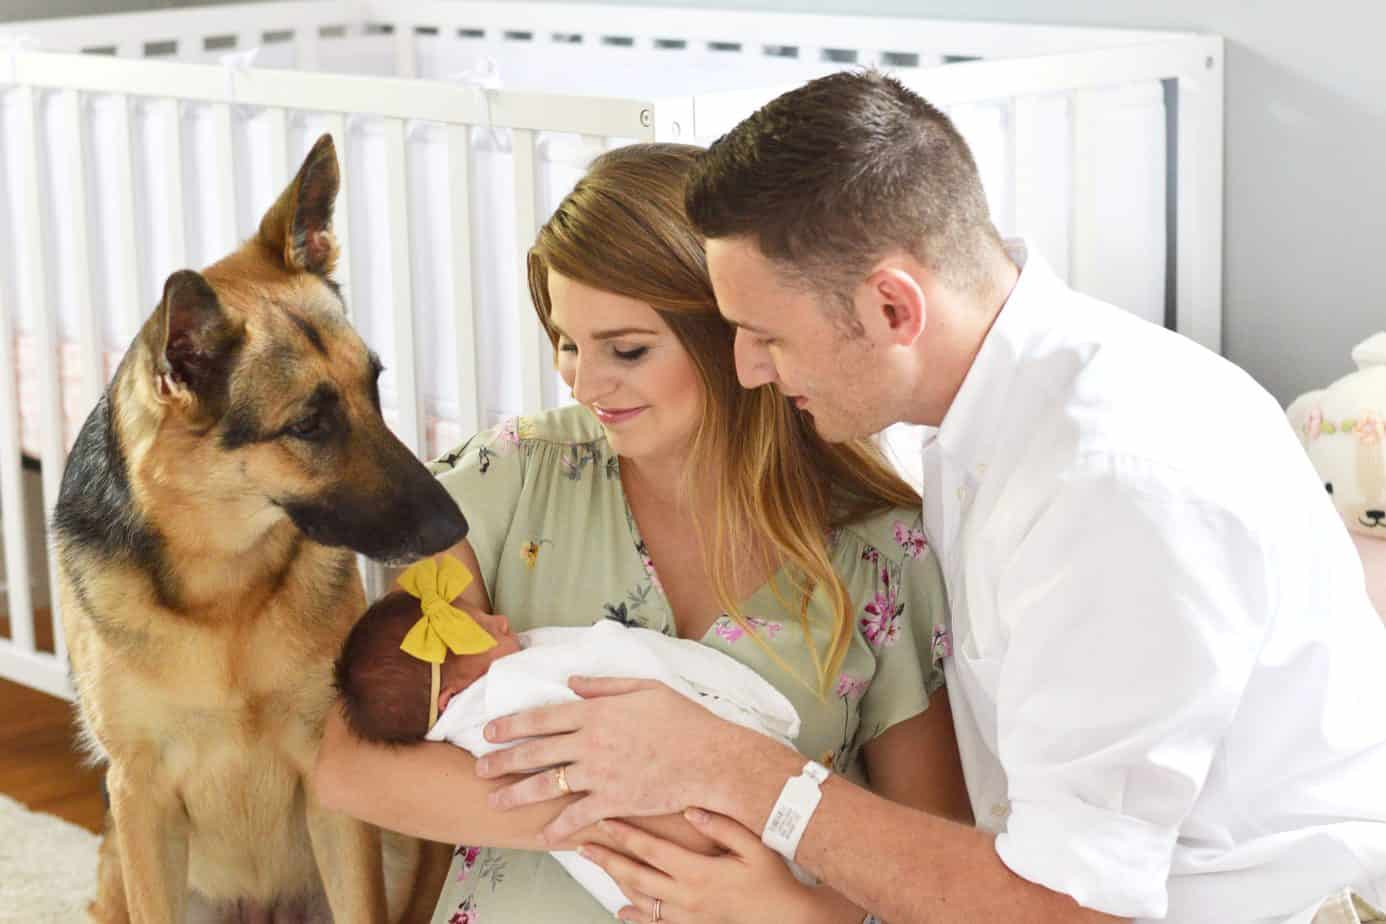 newborn photos in nursery